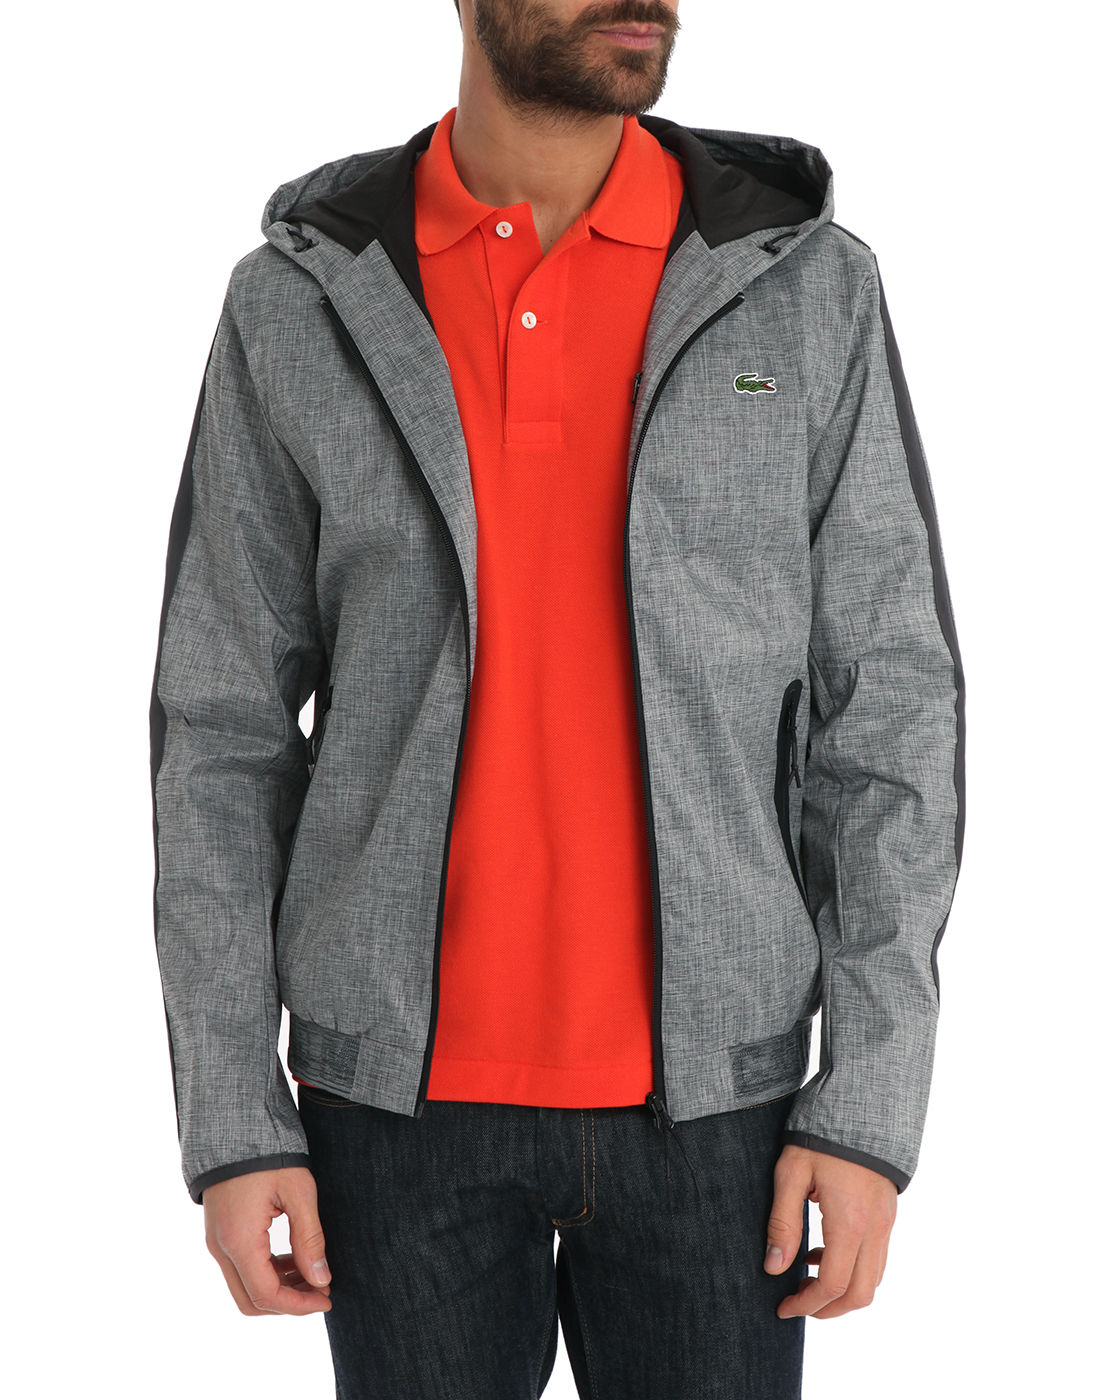 lacoste sport grey nylon jacket in gray for men grey lyst. Black Bedroom Furniture Sets. Home Design Ideas